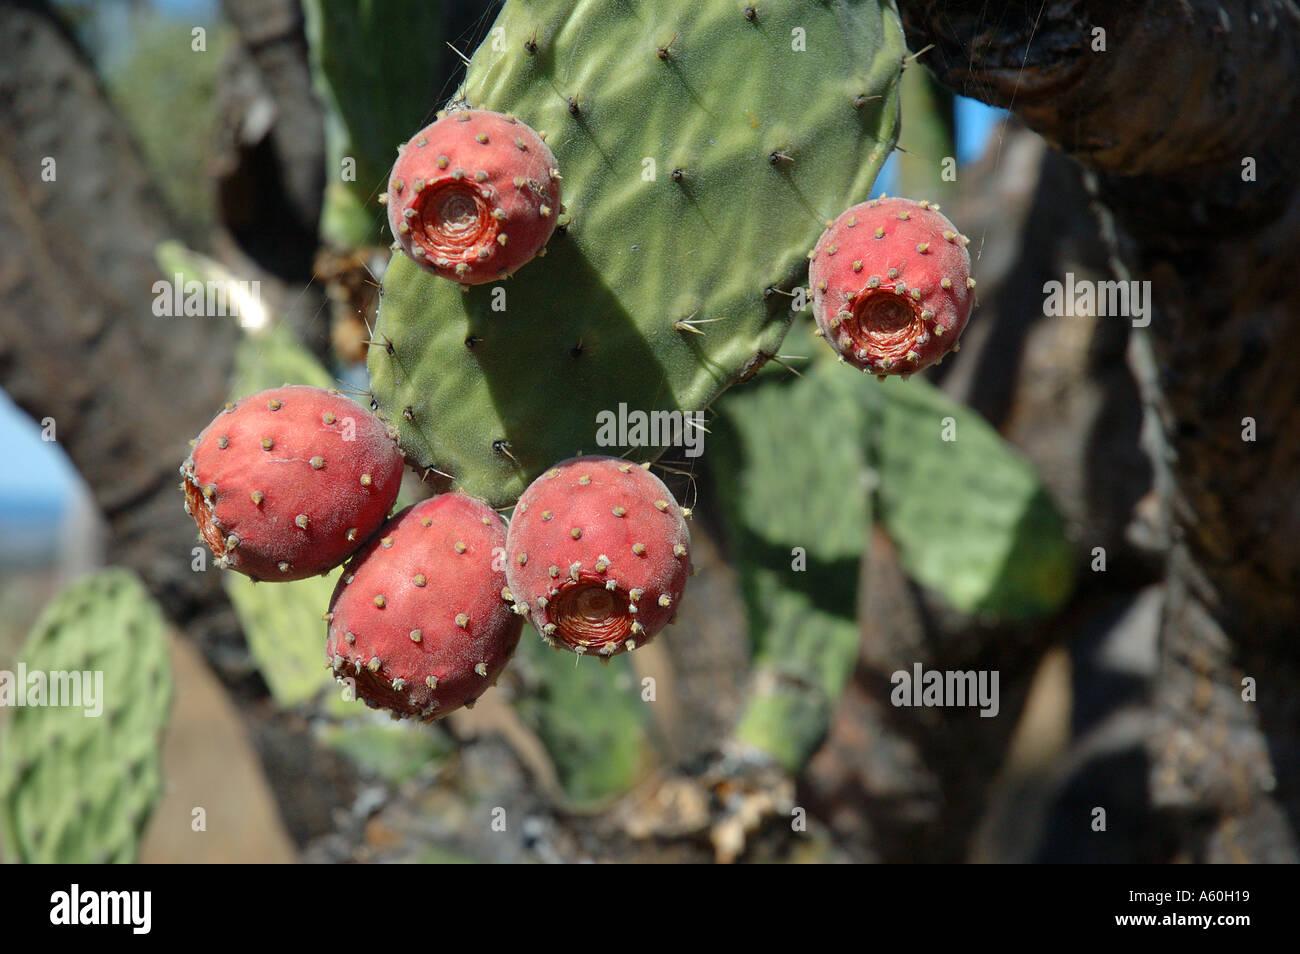 Prickly pear Opuntia ficus indicus cactus species bearing edible fruit Stock Photo